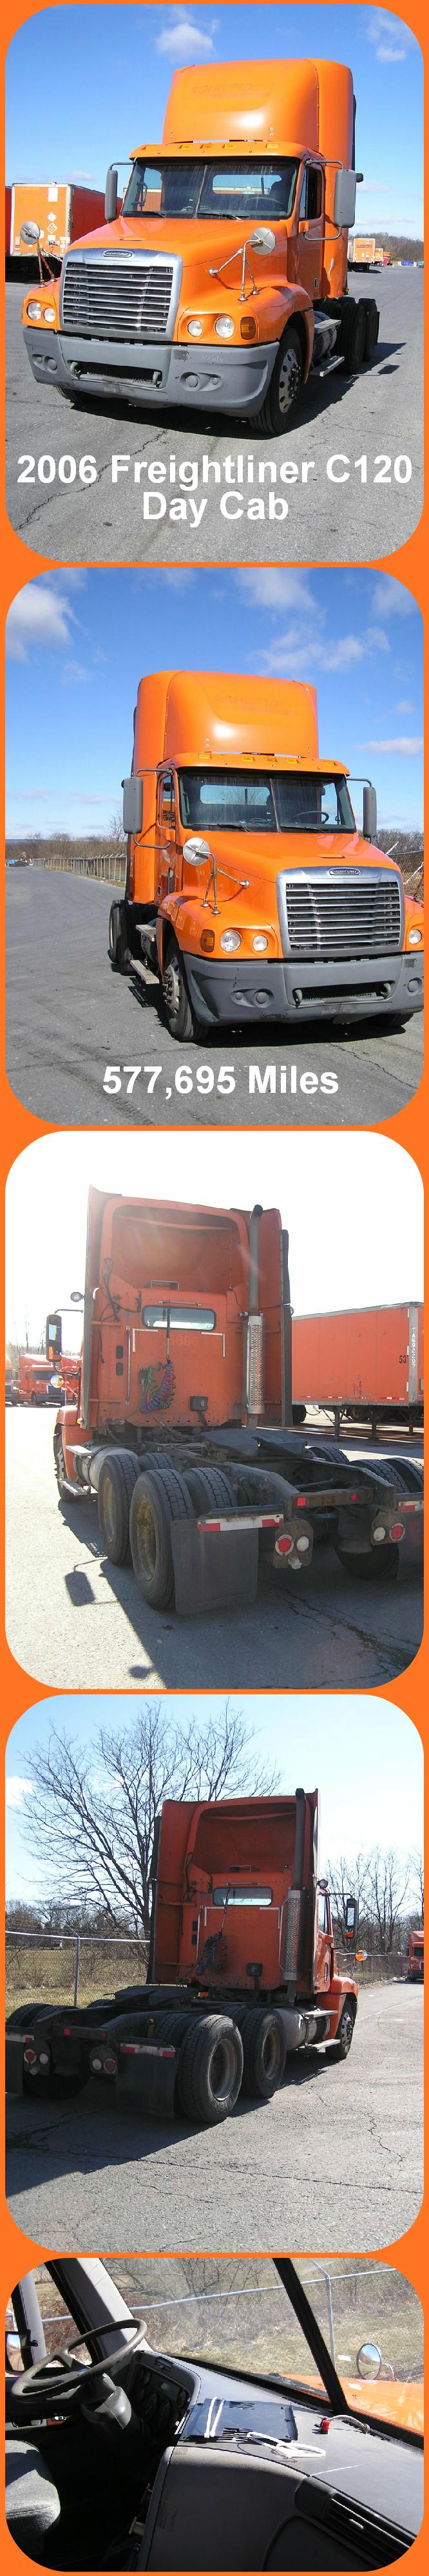 DealOfTheDay '06 Freightliner C120 Day Cab w/ 578K Miles